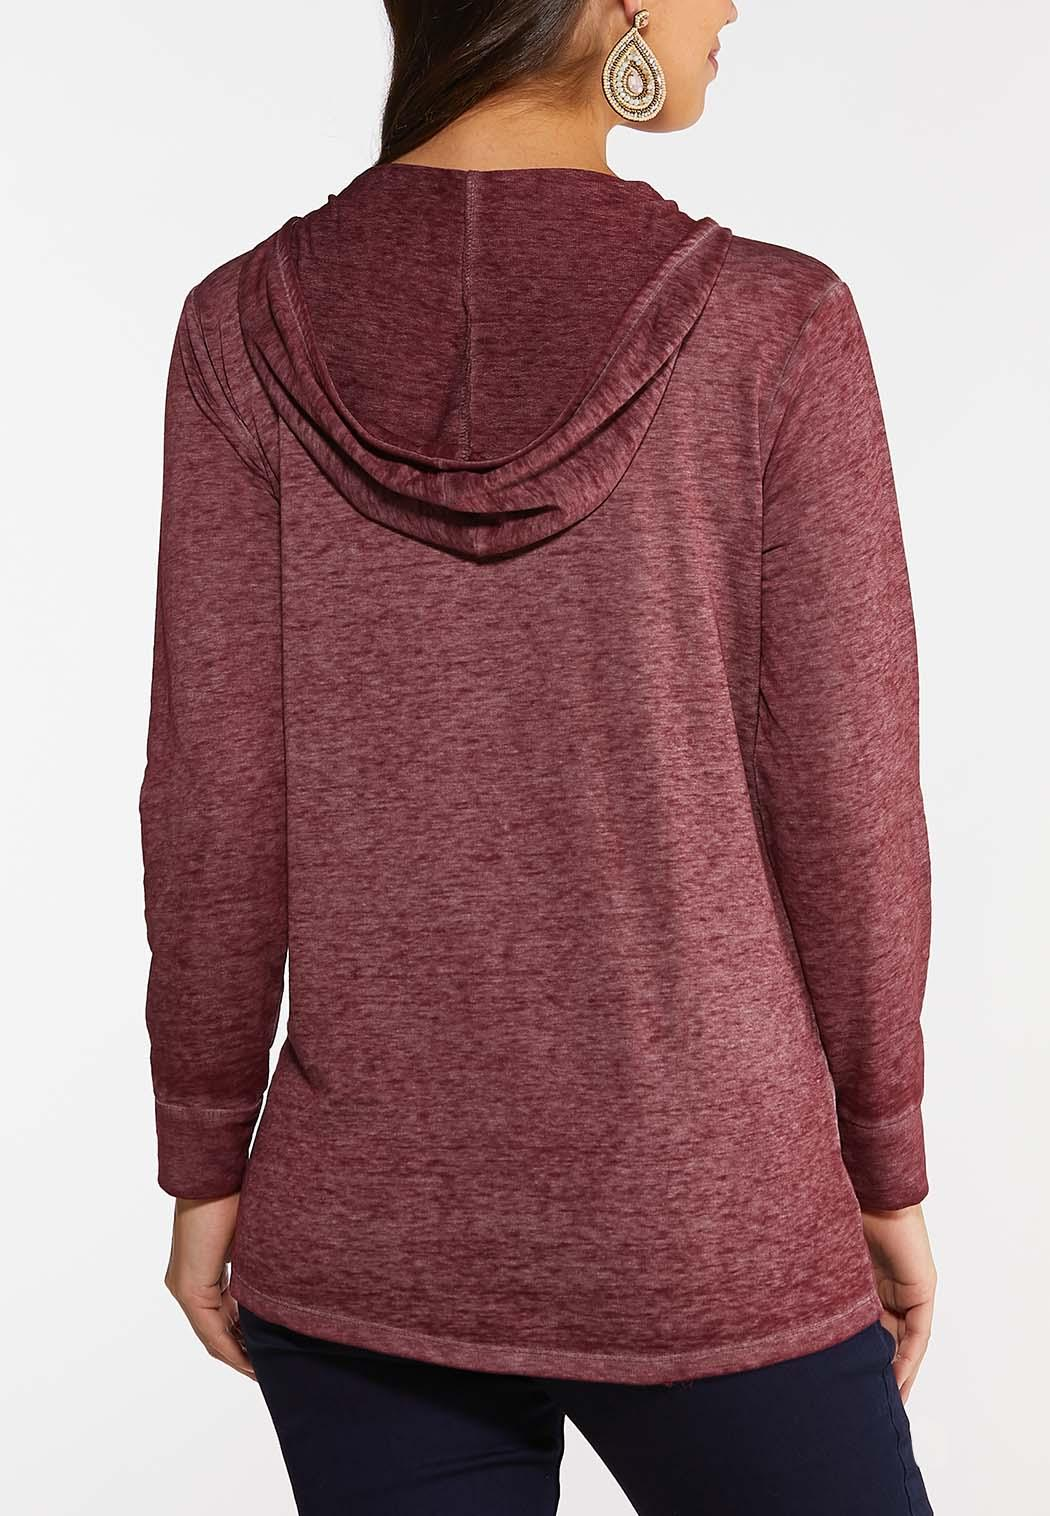 Lattice Neck Hooded Top (Item #44005972)